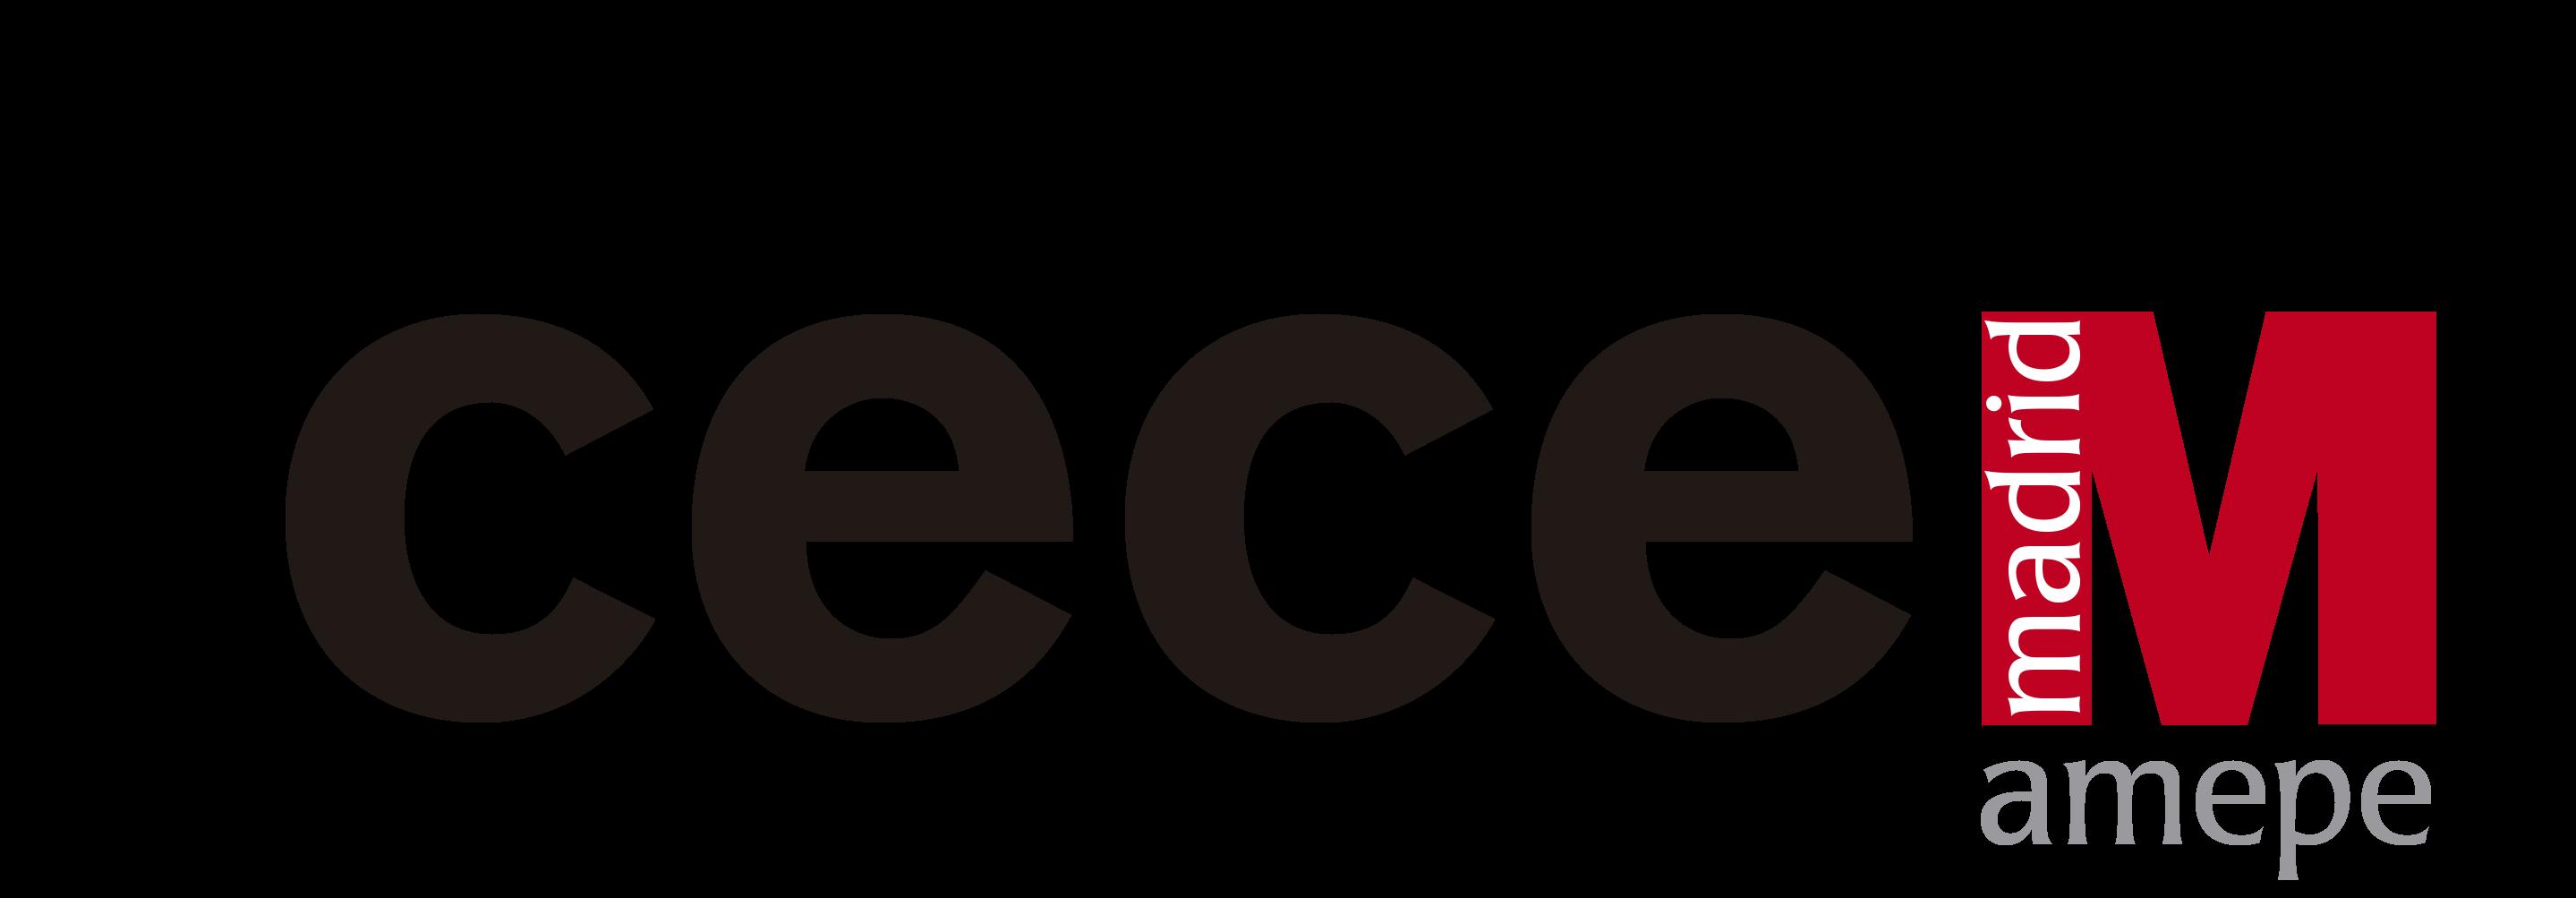 CECEMADRID